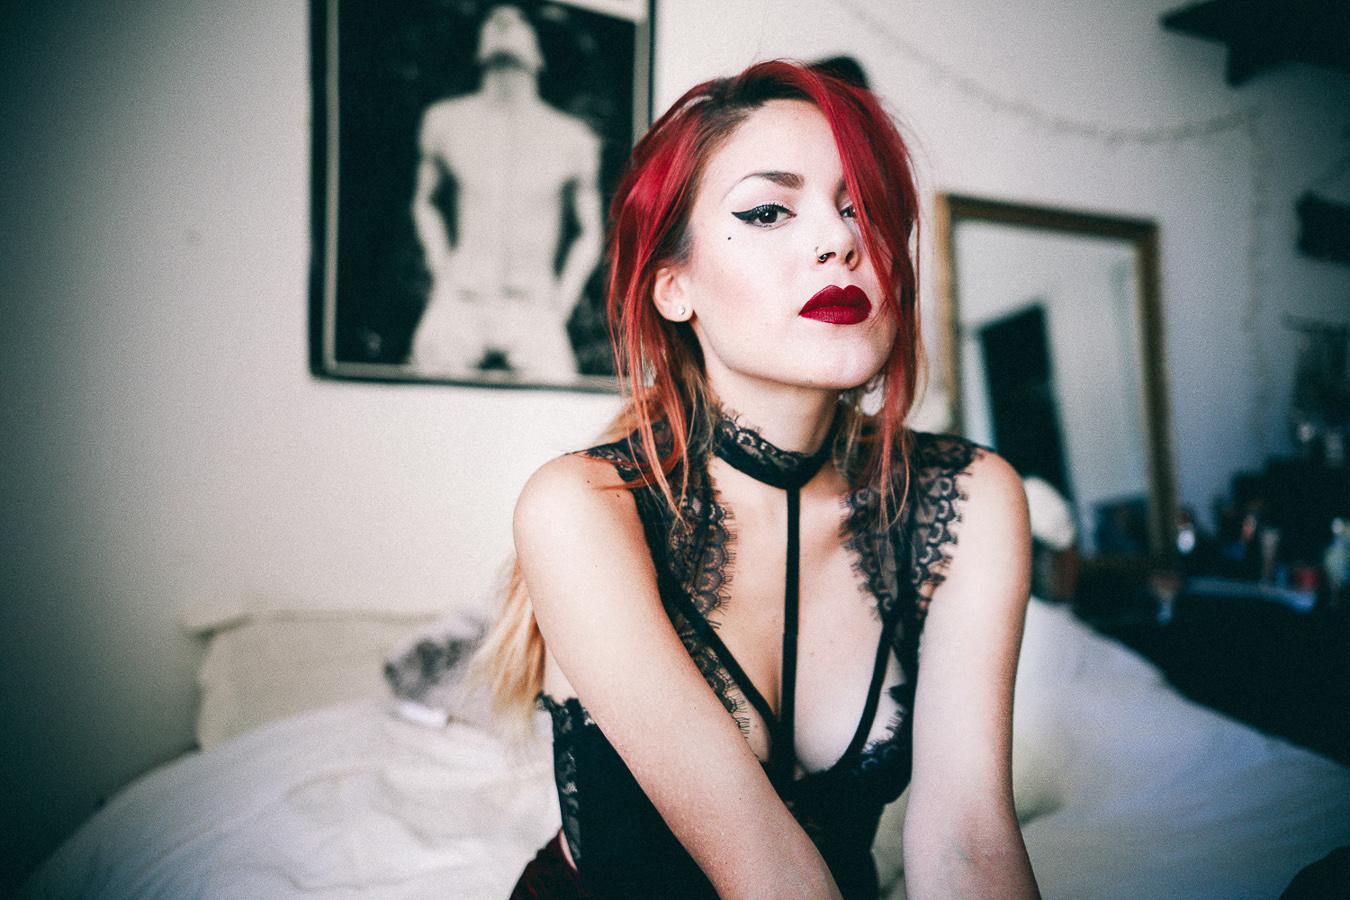 Le Happy wearing Nasty Gal lace choker corset